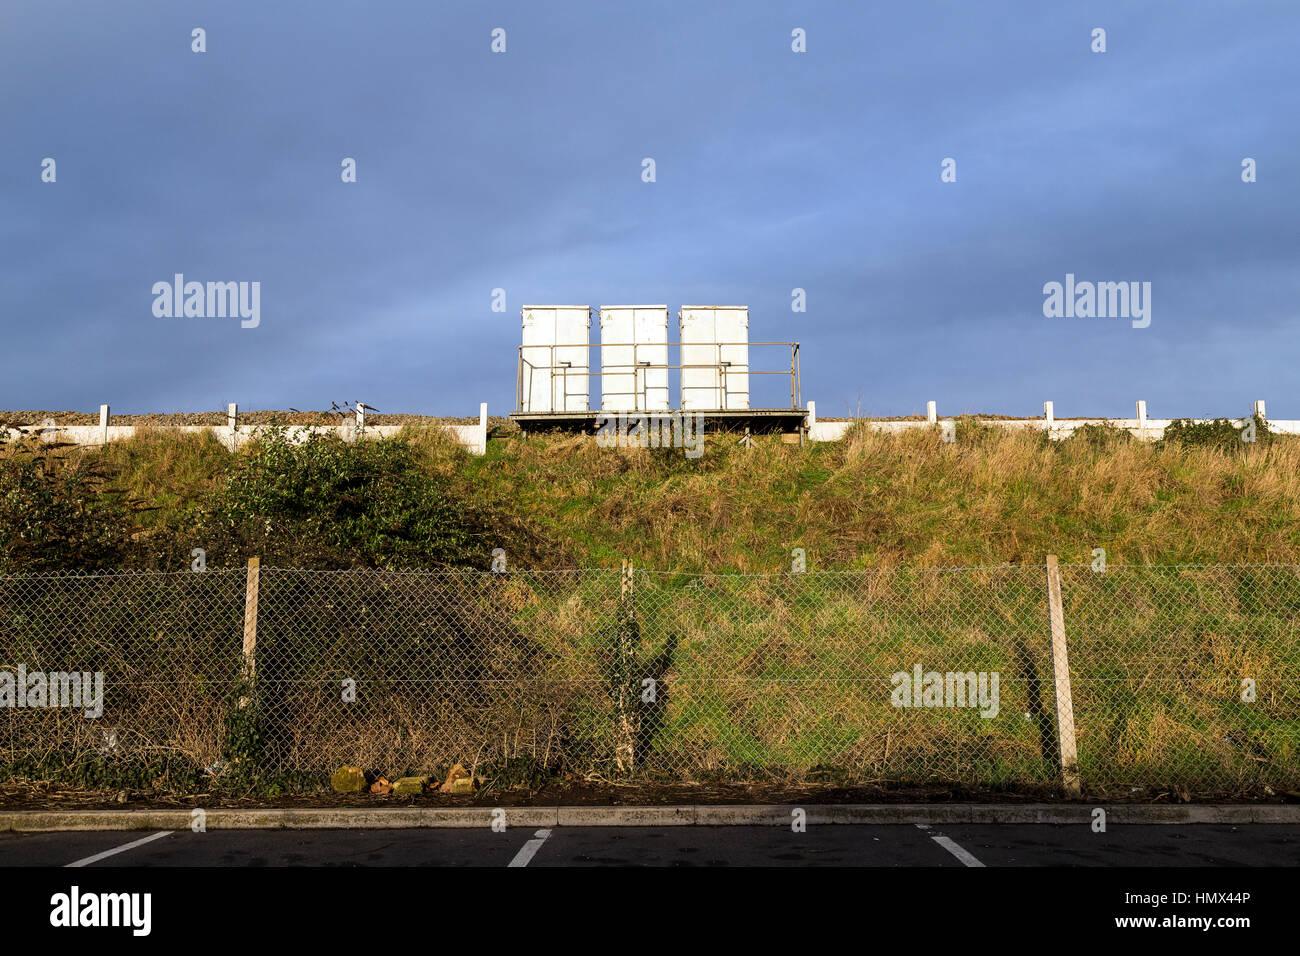 railway furniture on embankment of National Rail Network - Stock Image